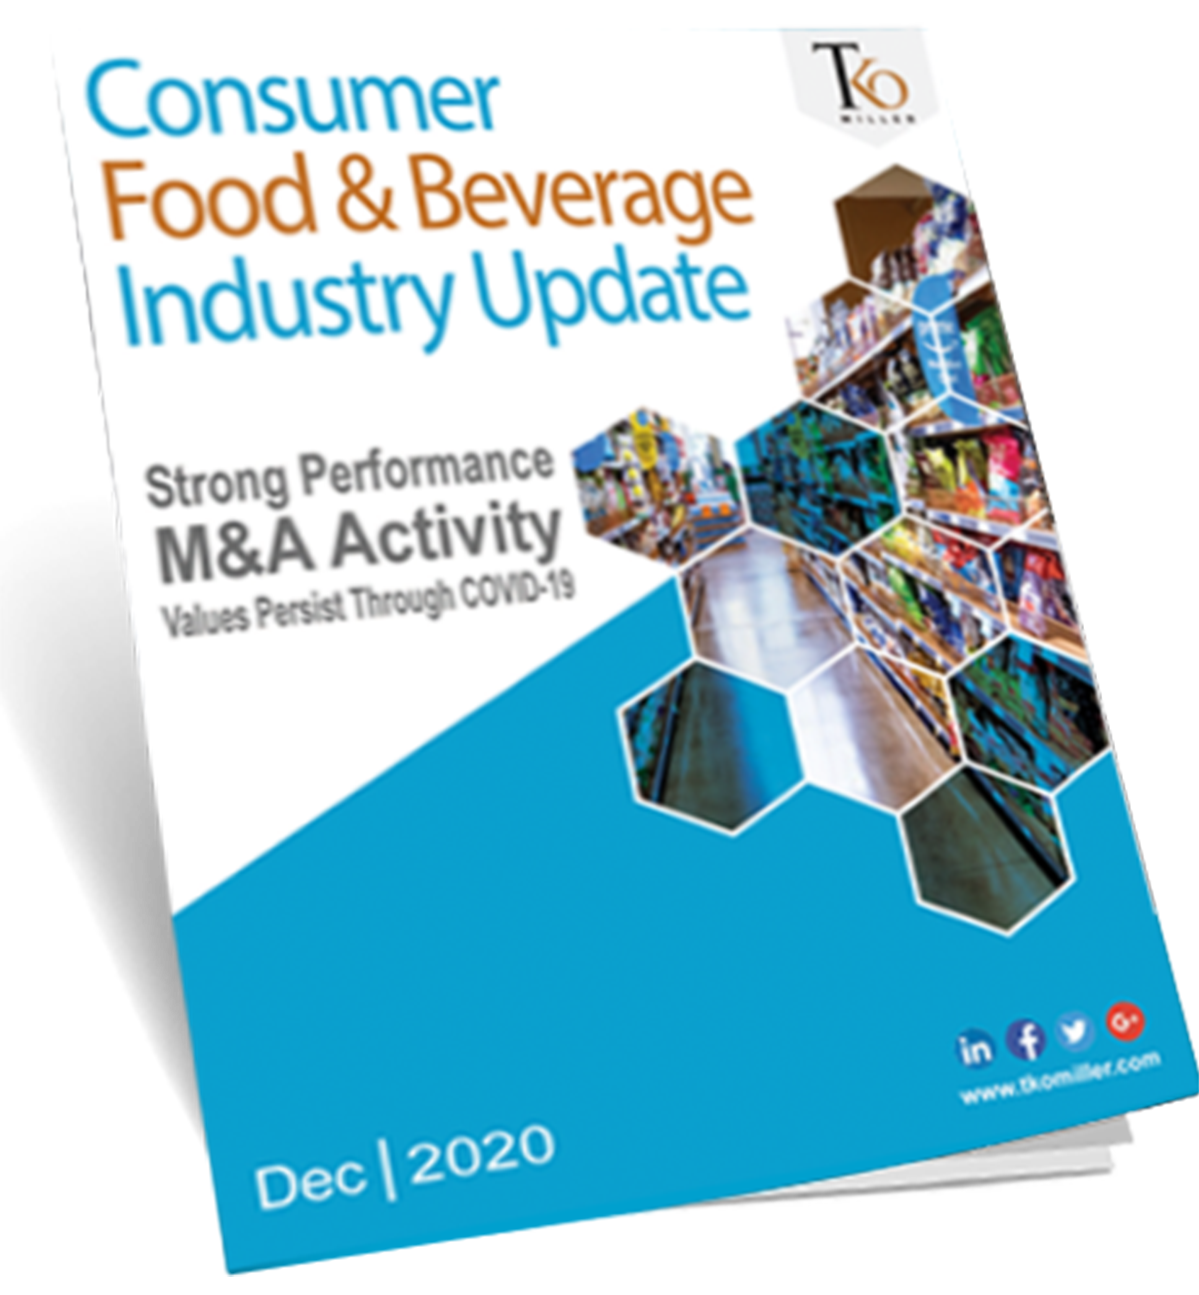 Consumer Food & Beverage Industry Update - Cover eBook